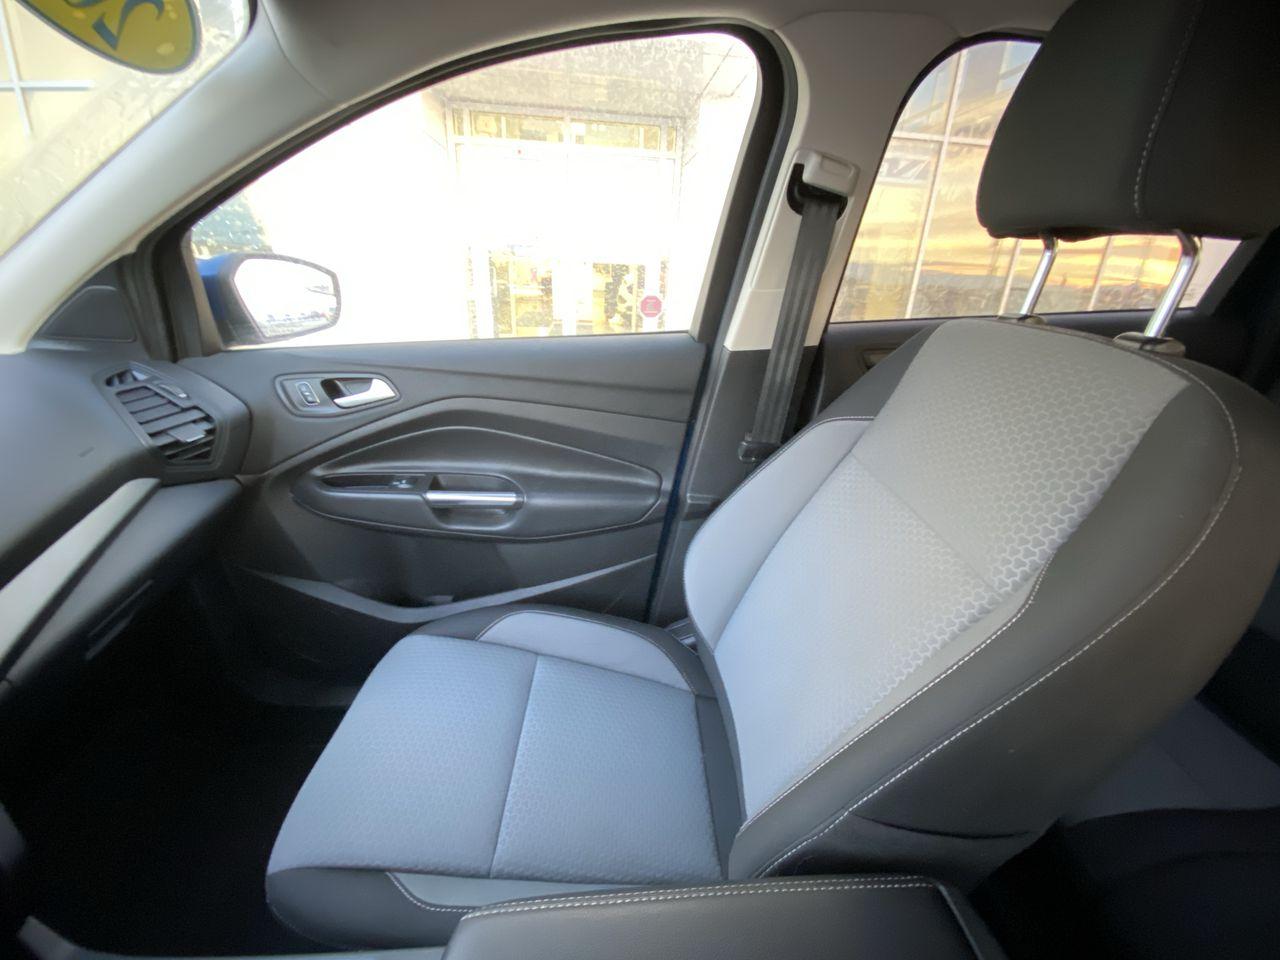 2017 Ford Escape SE  - Certified - Low Mileage